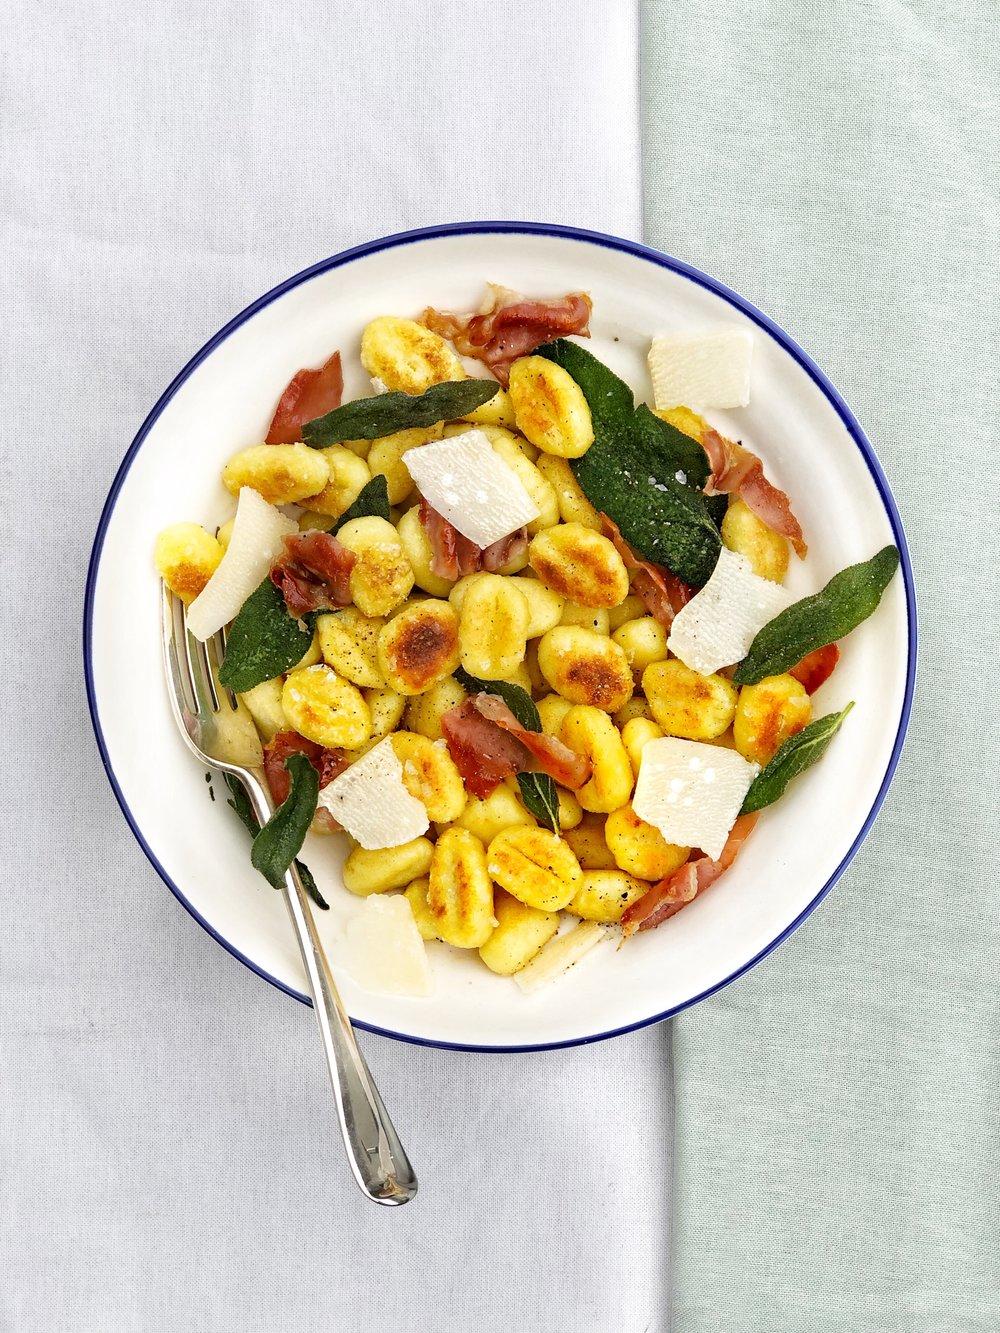 gnocchi with crispy sage and prosciutto - Margie Nomura